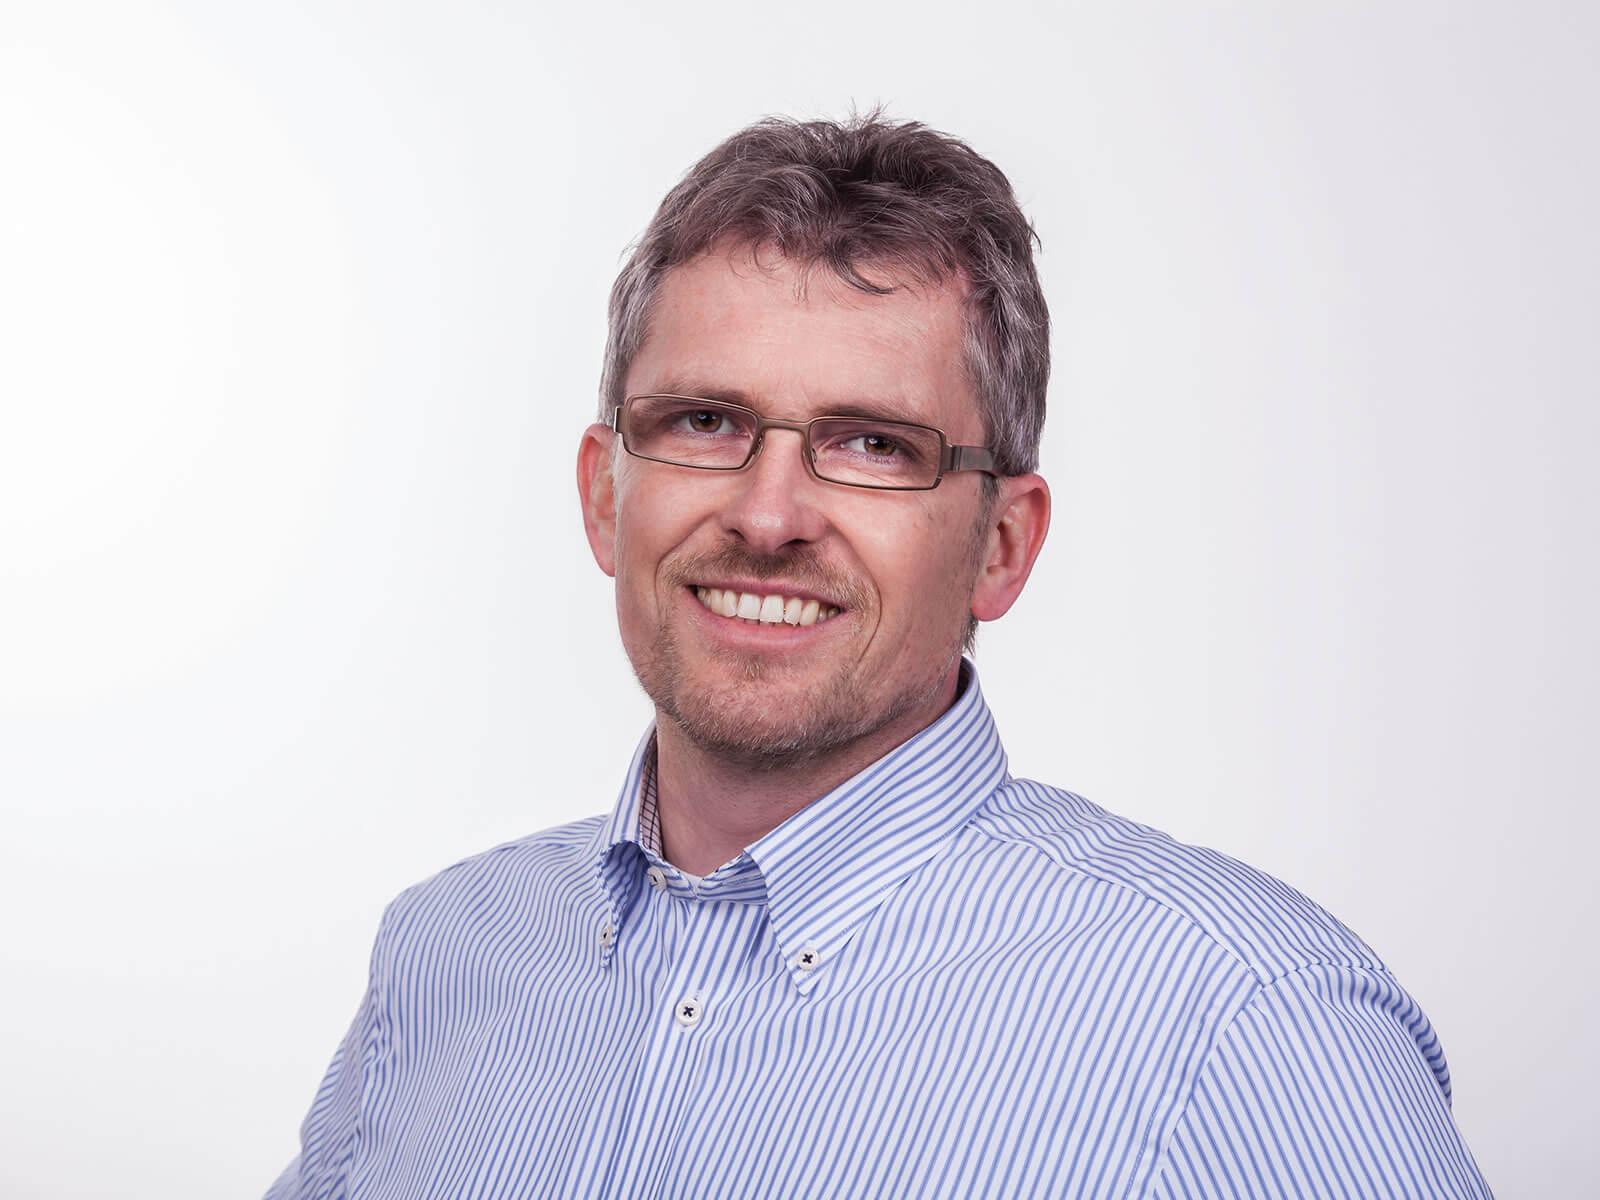 Jörg Schölzel